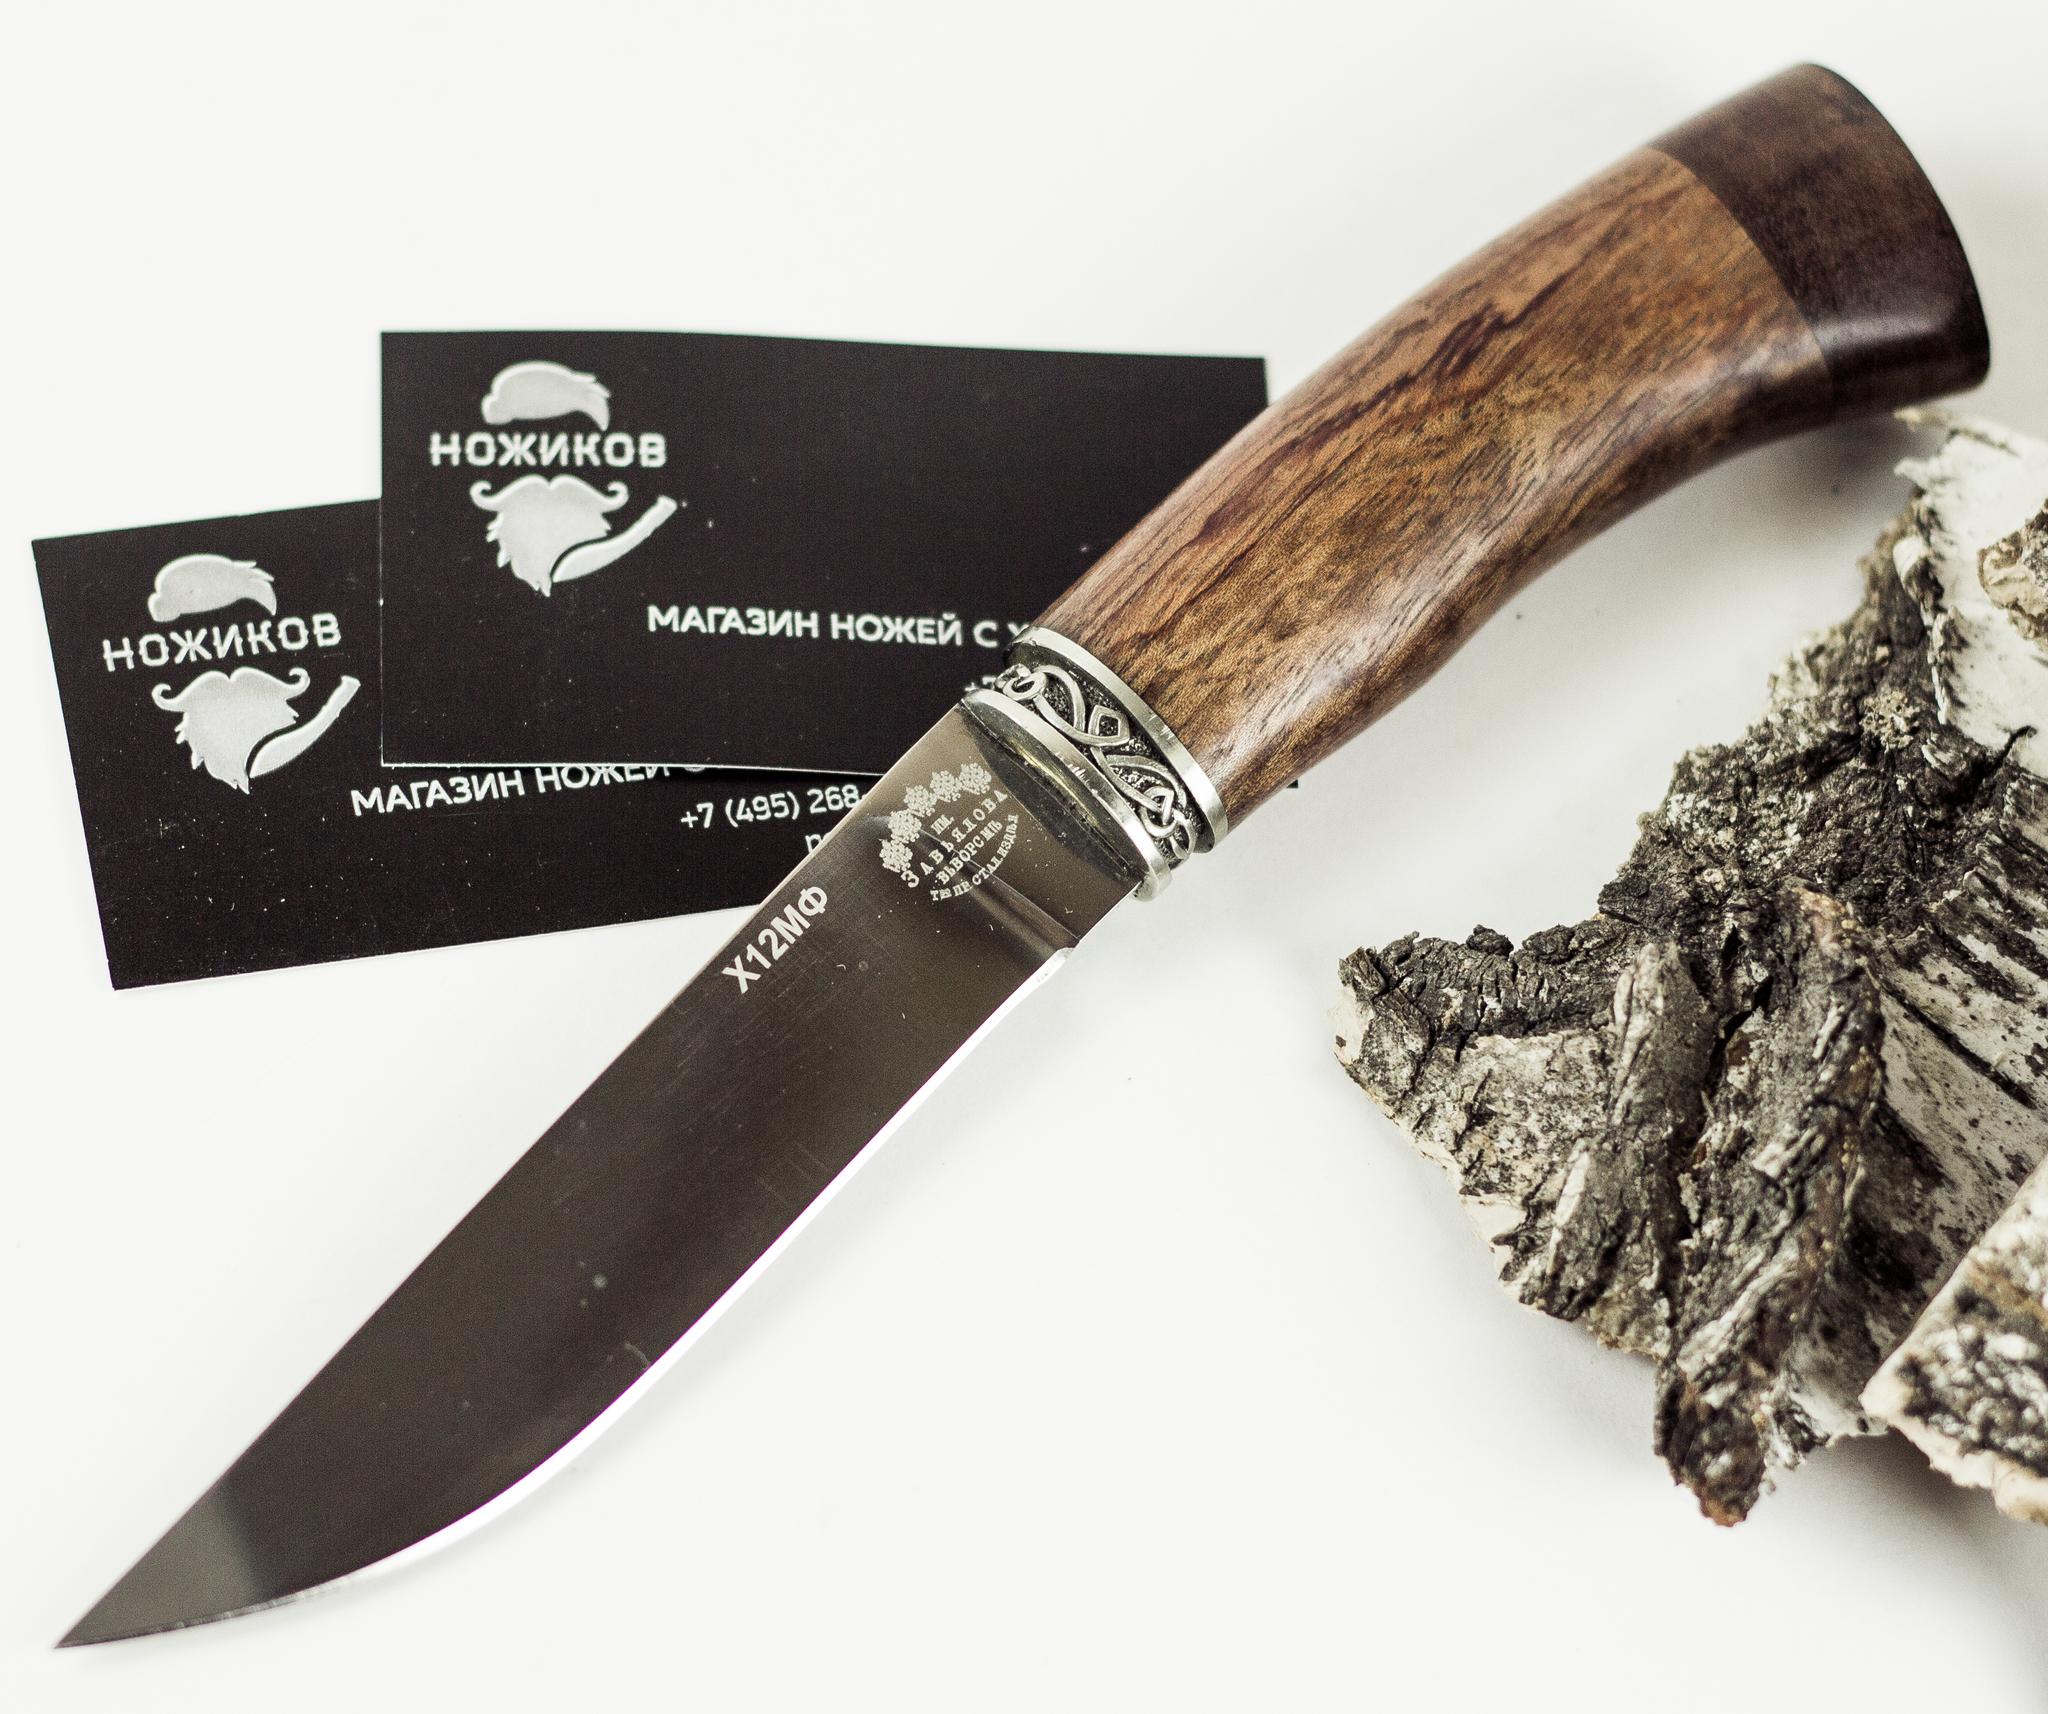 Нож Ладья-4  Х12МФНожи Ворсма<br><br>